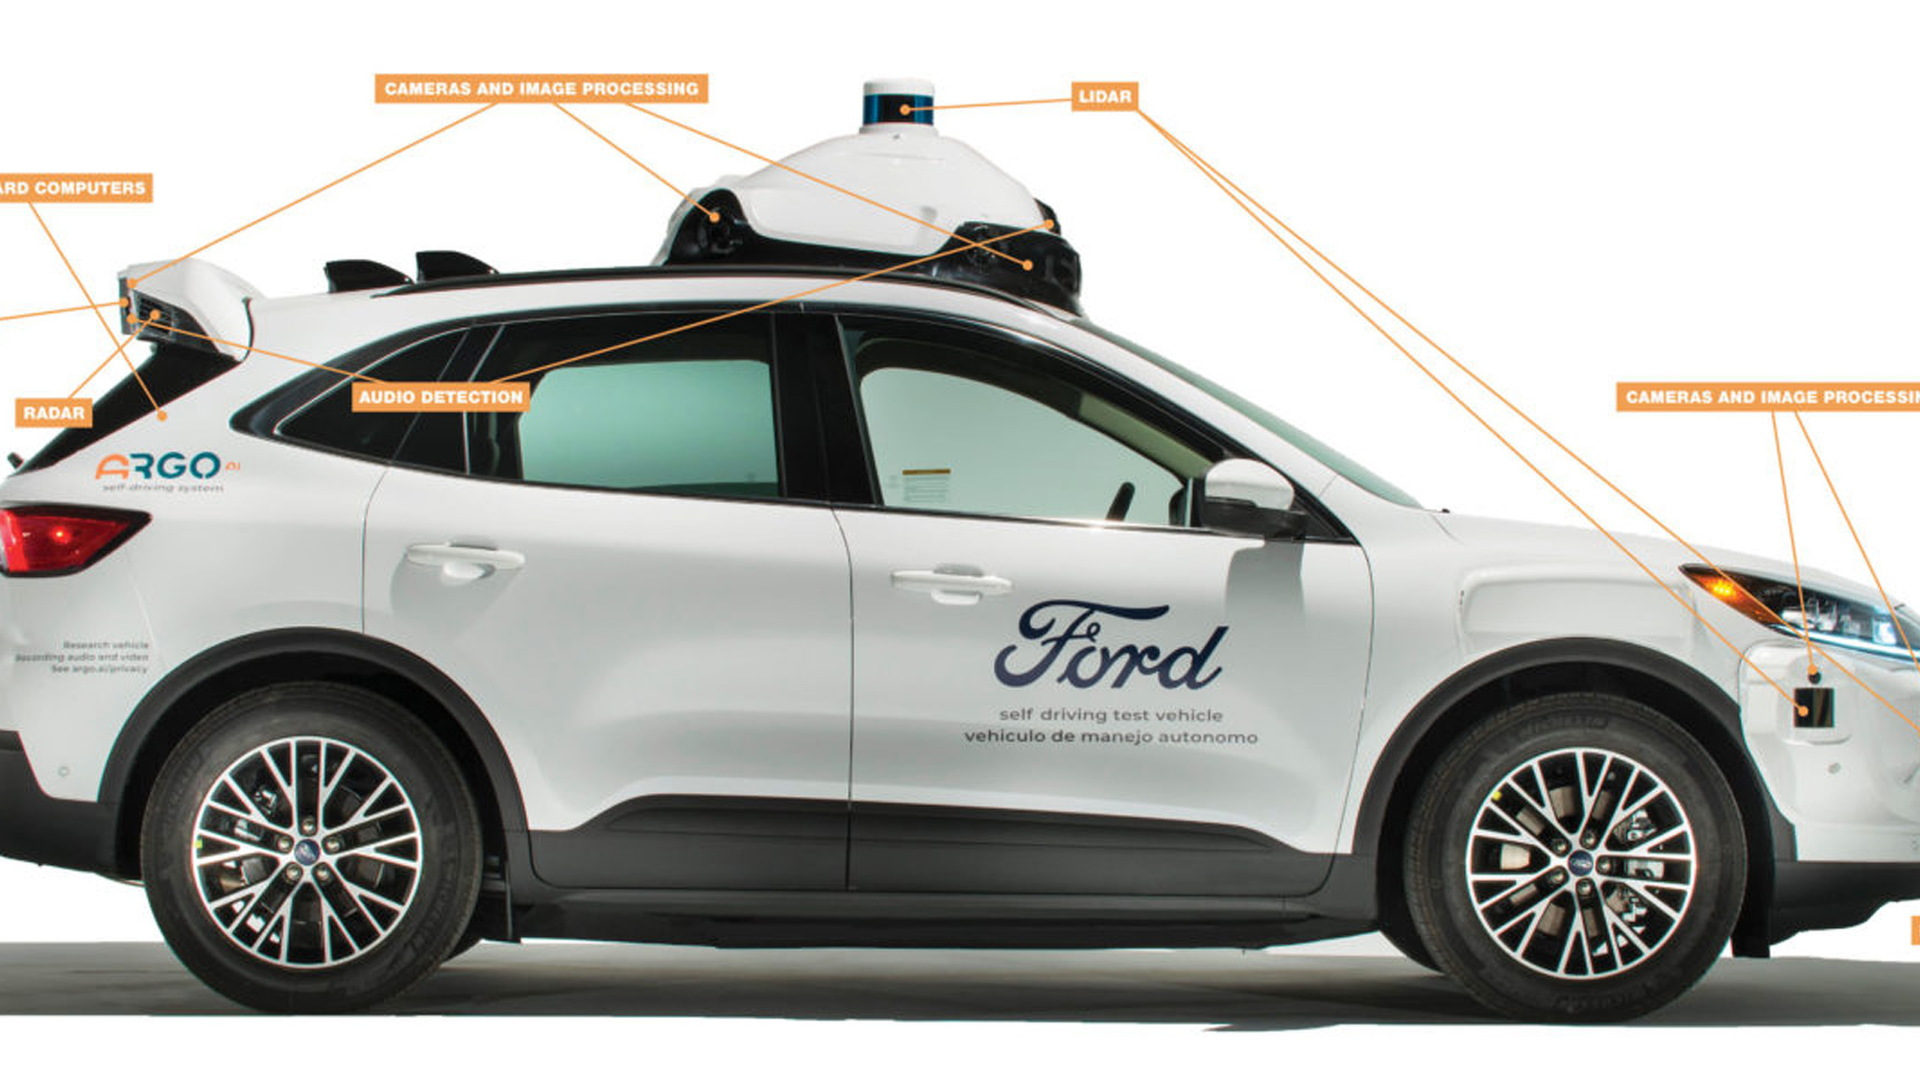 Argo AI self-driving car prototype